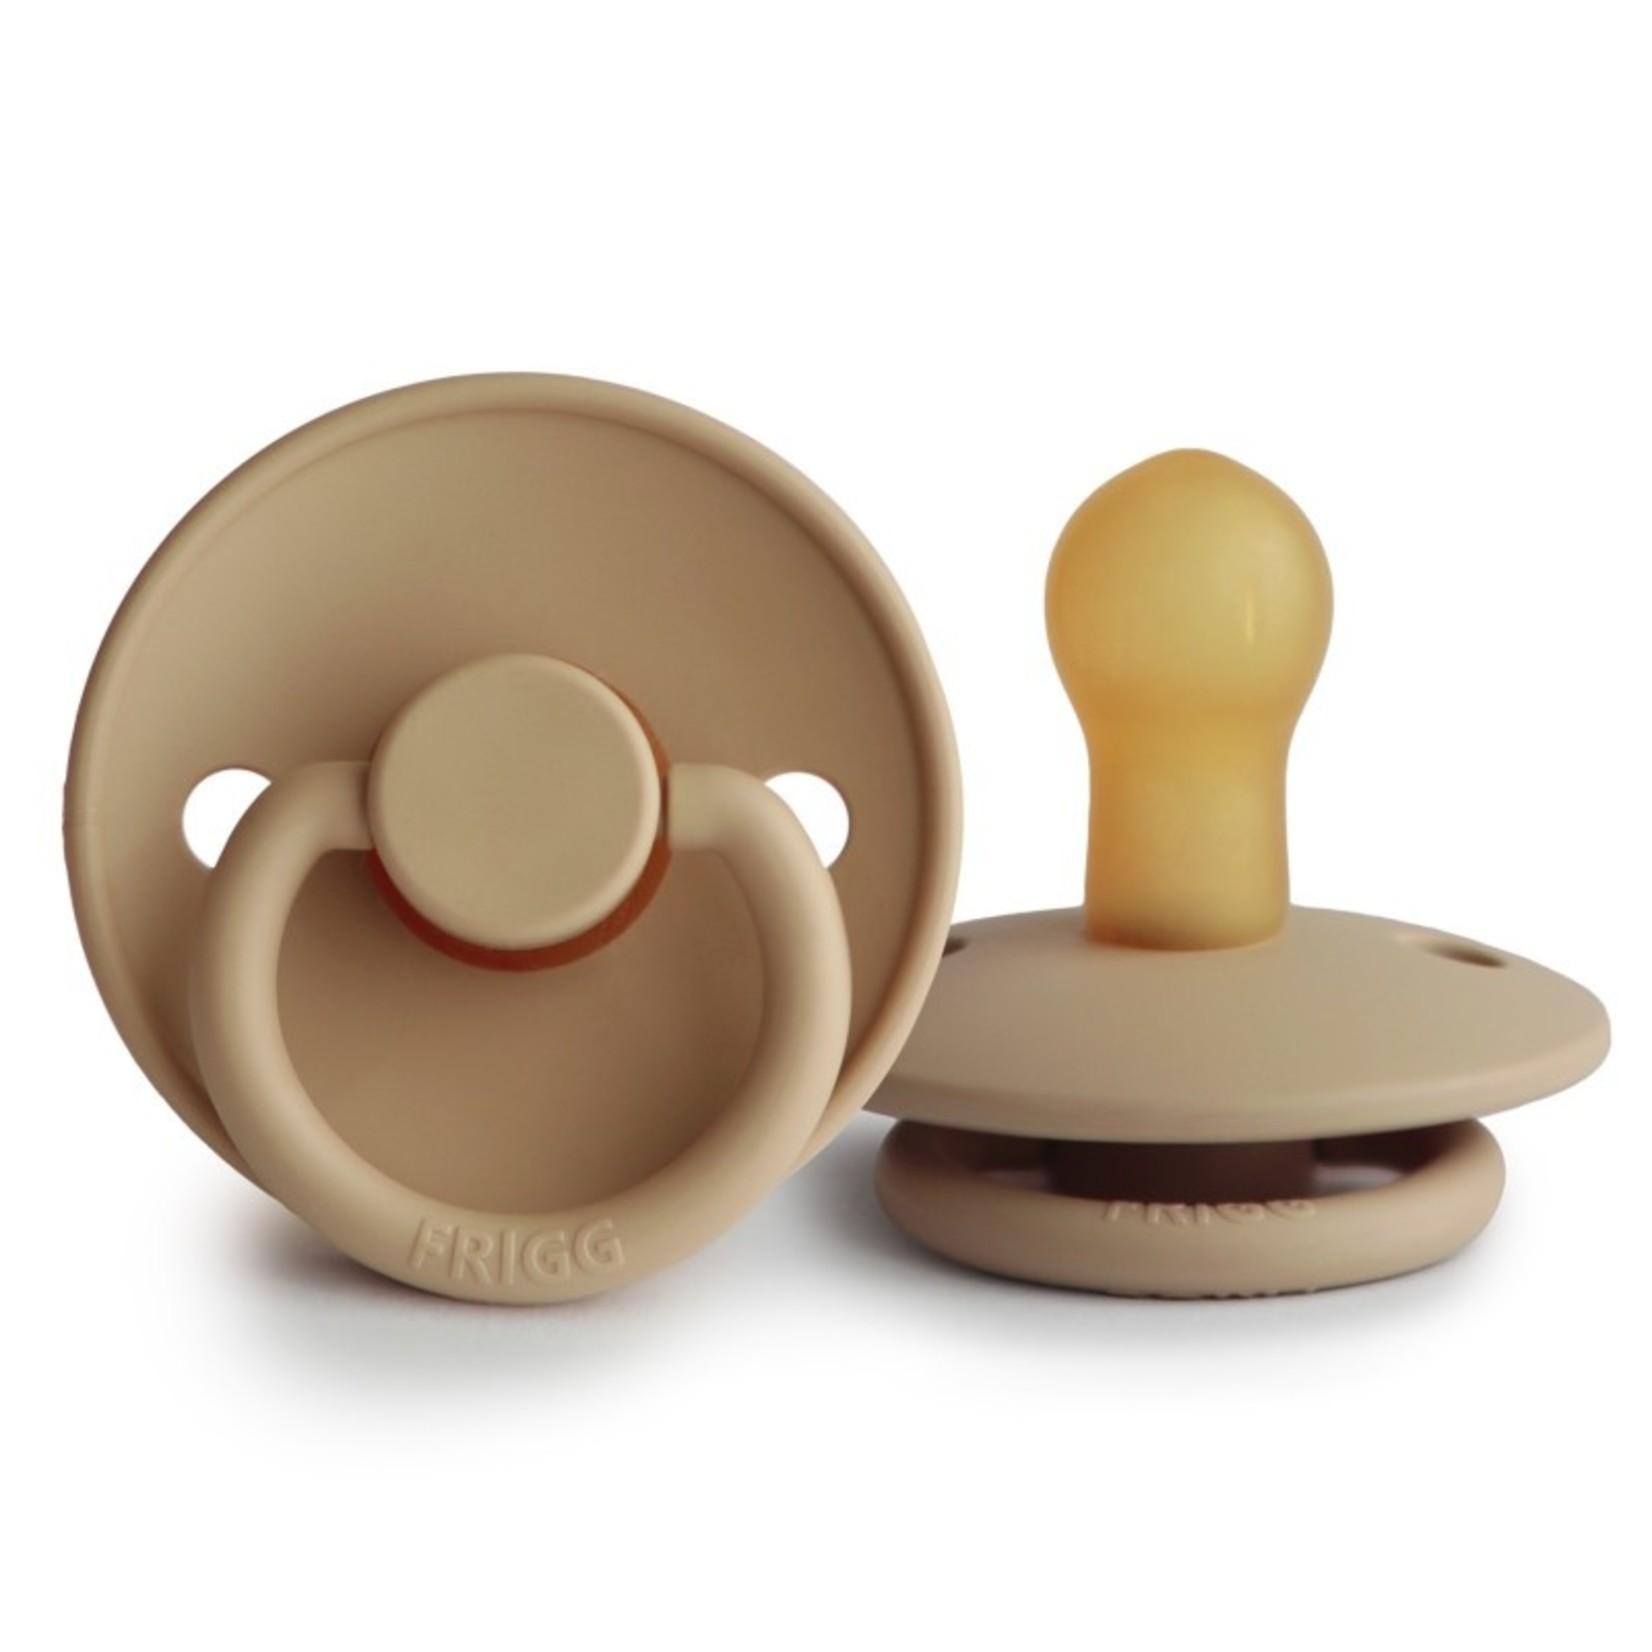 FRIGG FRIGG - CLASSIC - Fopspeen latex - croissant